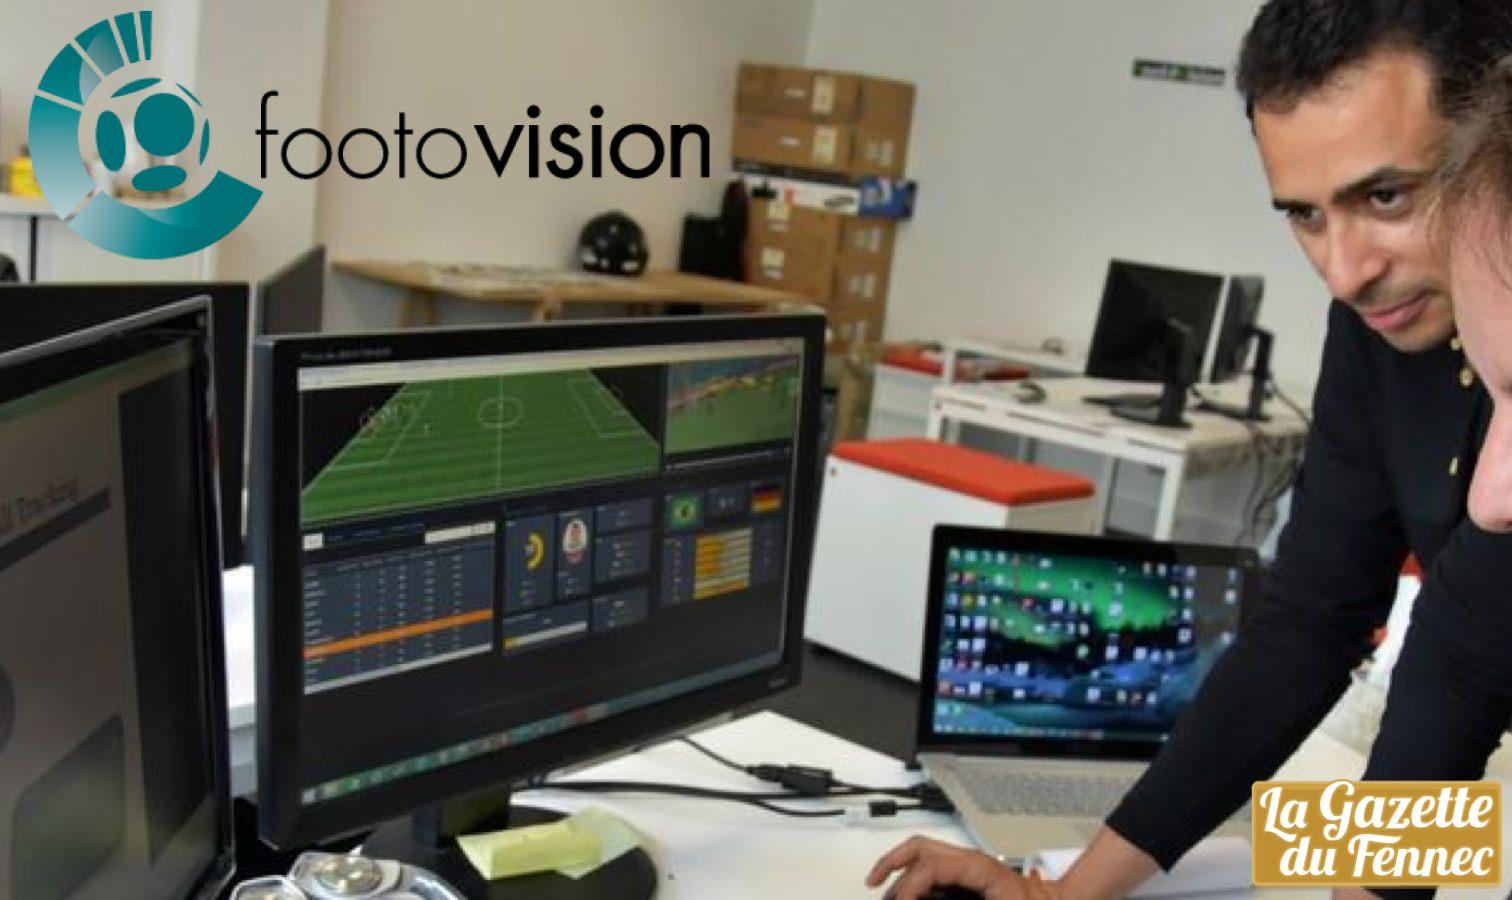 footovision analyse